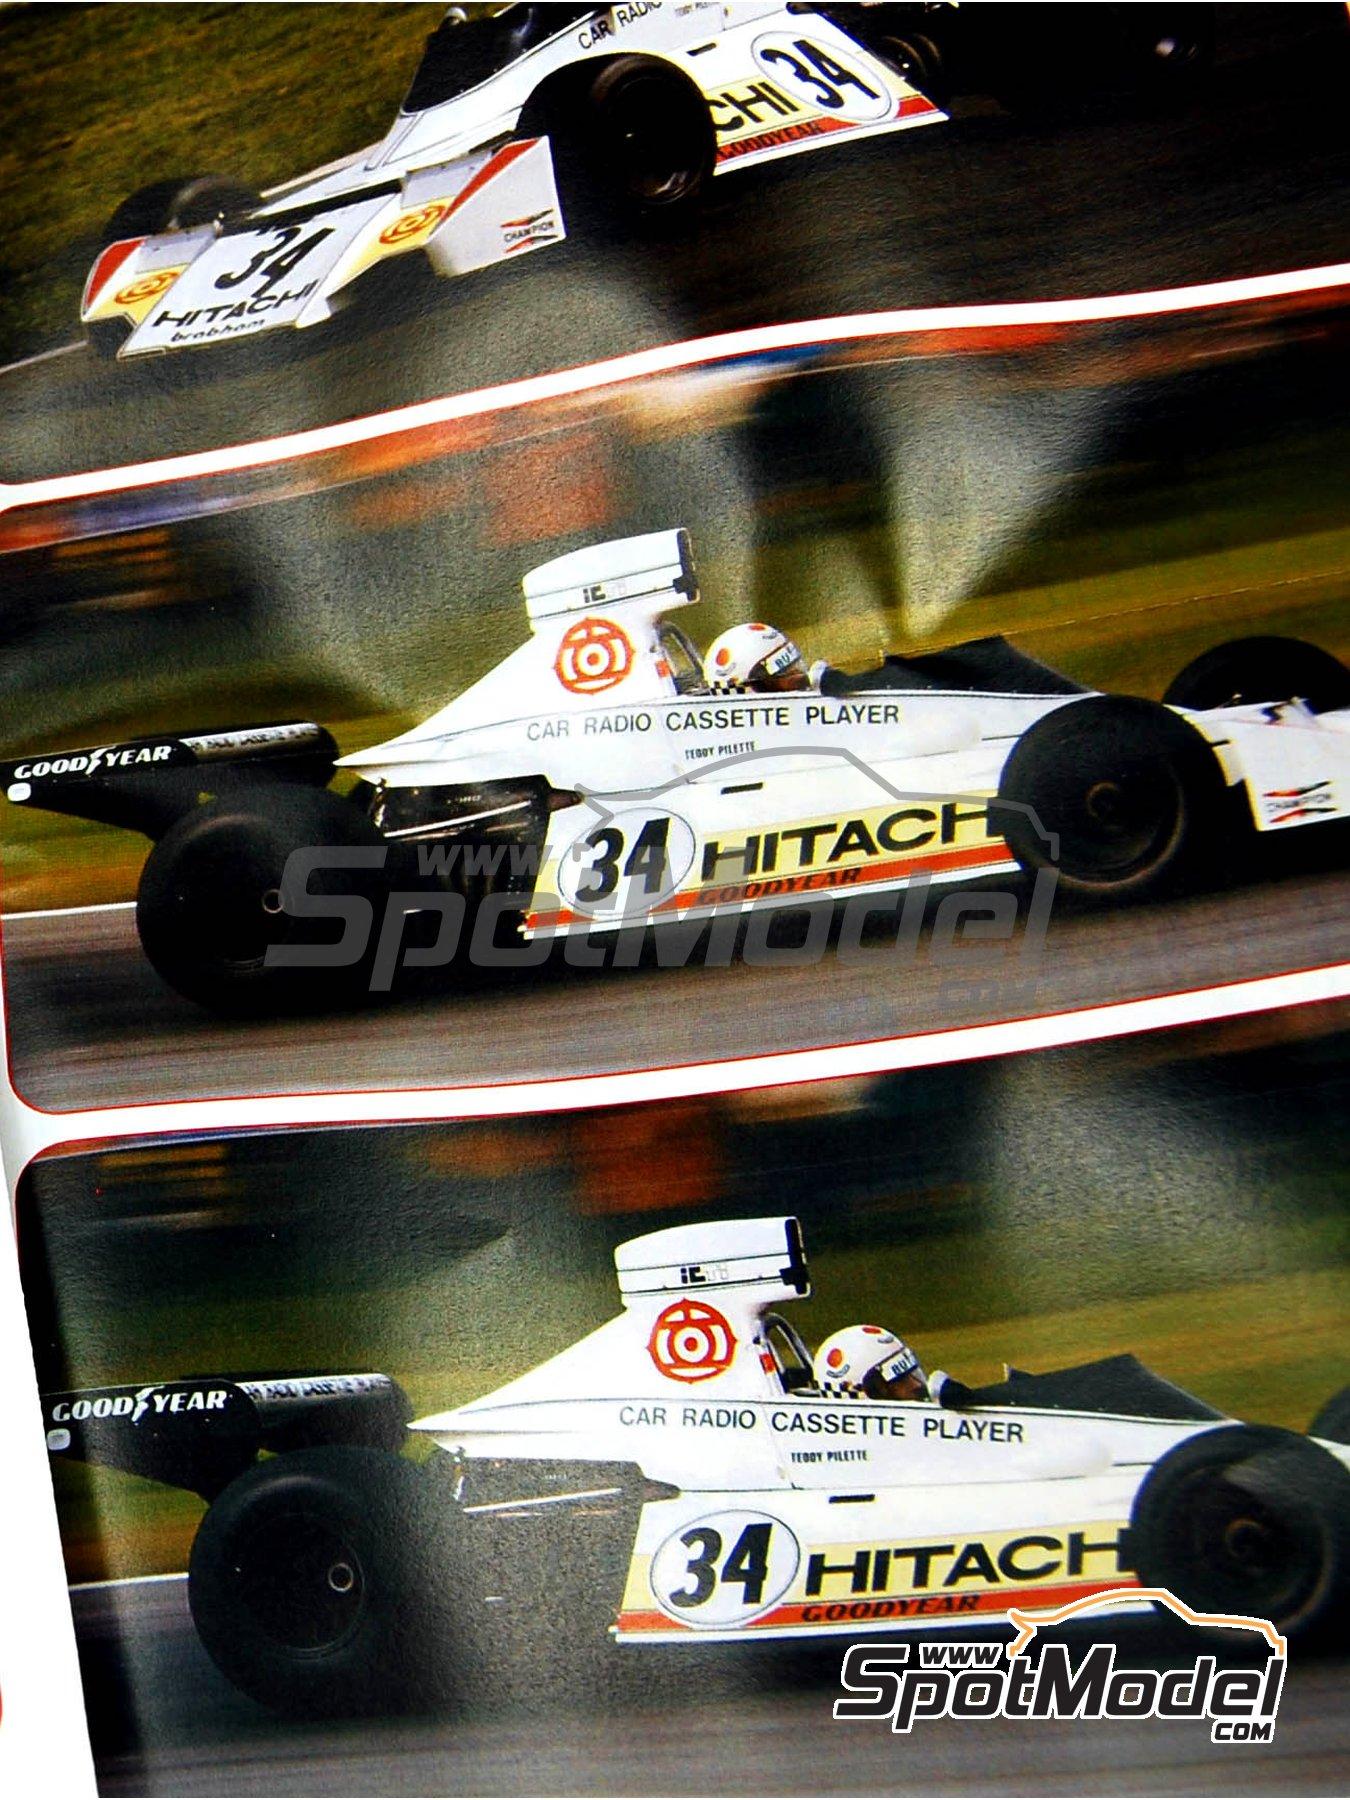 Brabham Ford BT42/3 Hitachi - Gran Premio de Fórmula 1 de Belgica 1974   Maqueta de coche en escala1/43 fabricado por Tameo Kits (ref.SLK092) image